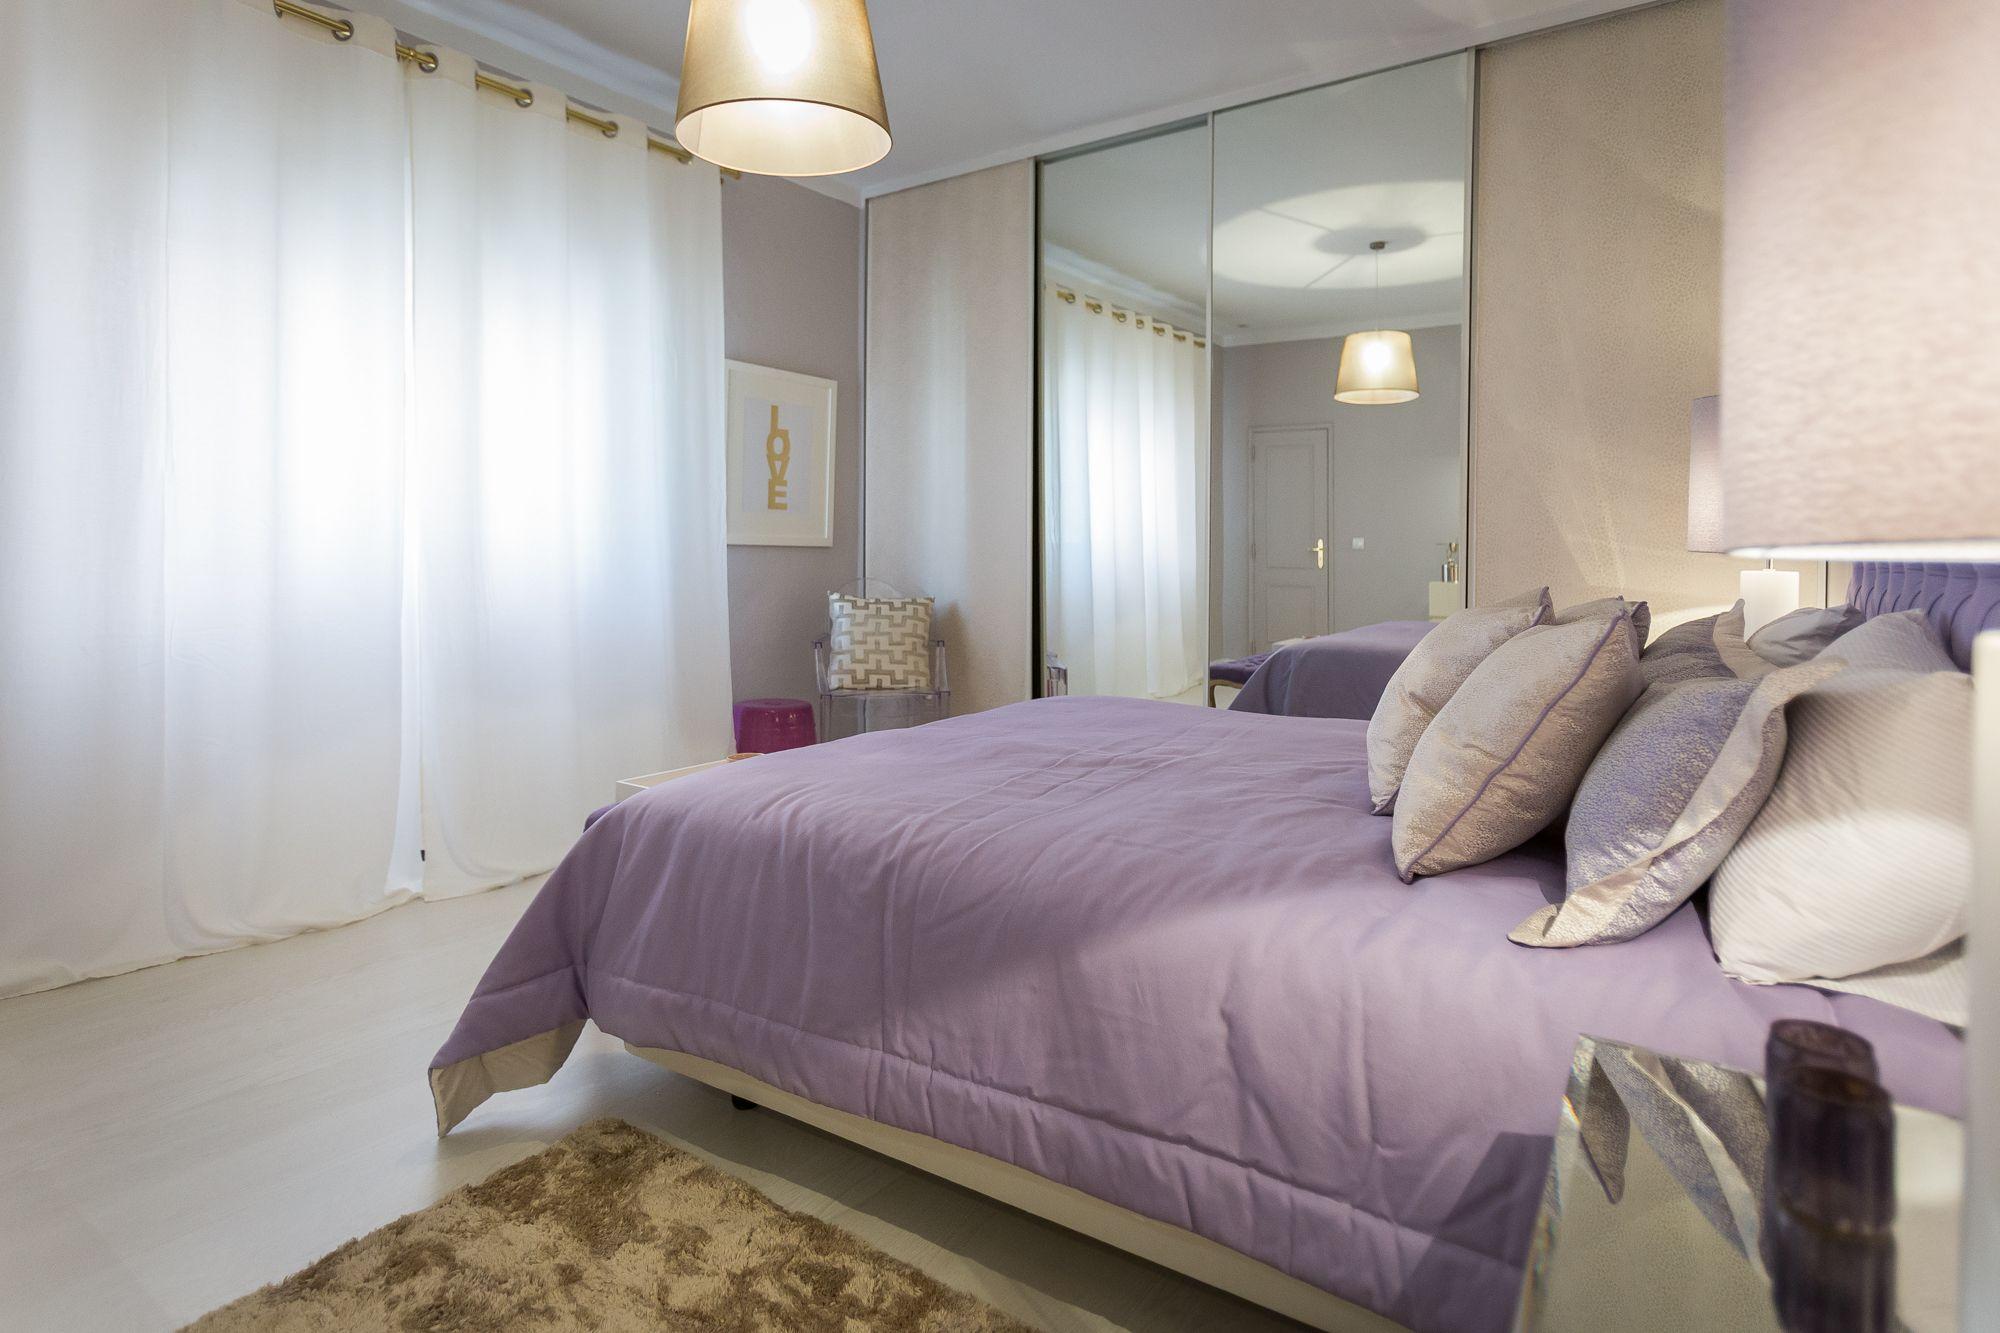 Mirror nightstands contemporary bedroom kimberley seldon design - Ana Antunes Quarto Bedroom Cama De Casal Double Bed Cushions